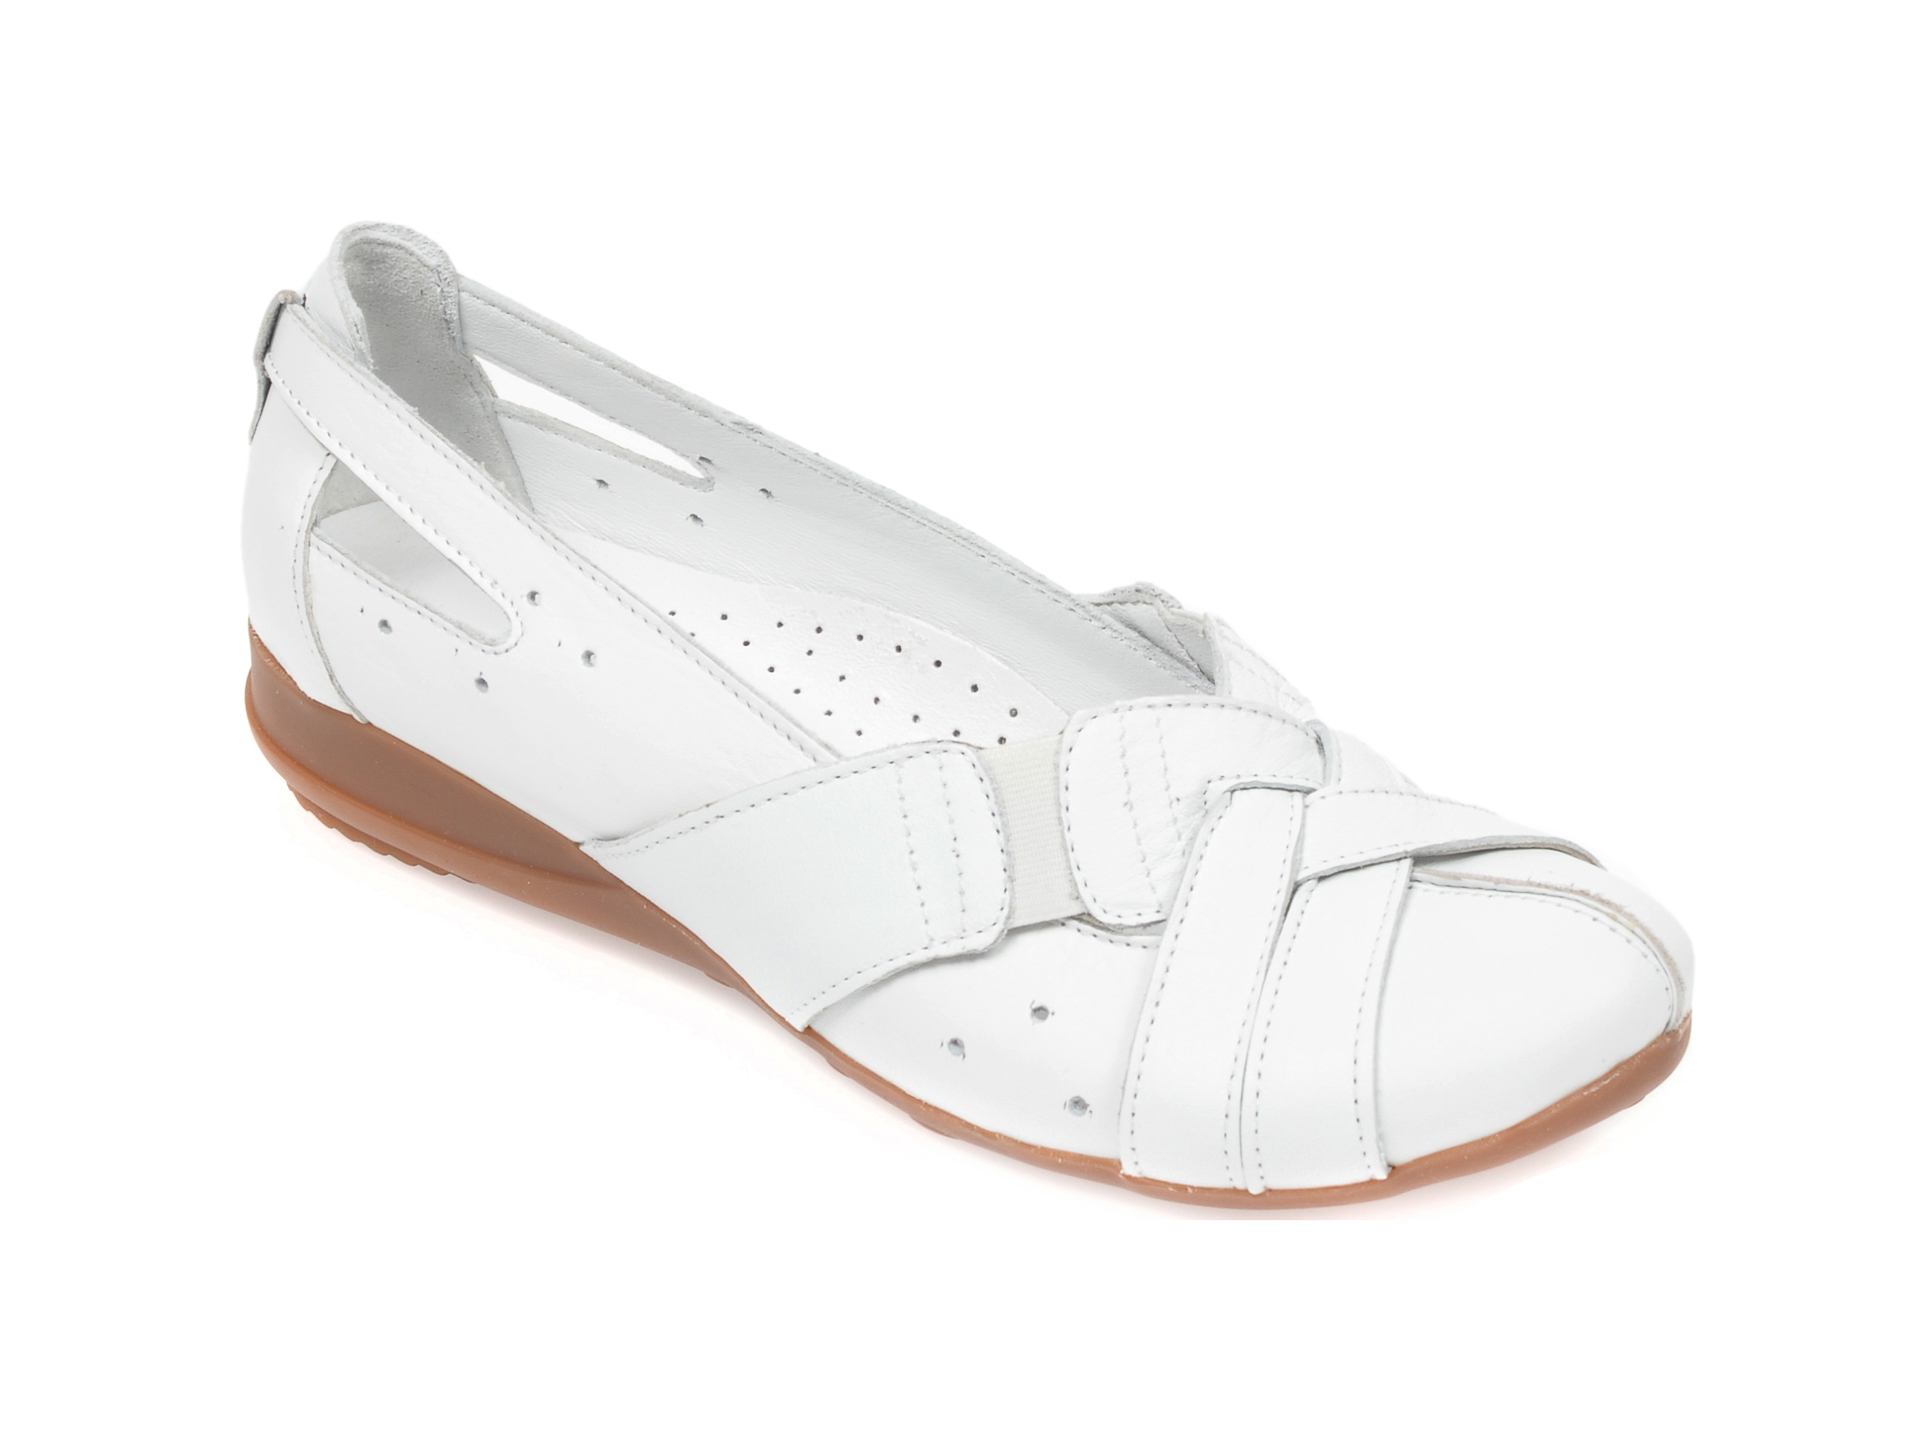 Pantofi FLAVIA PASSINI albi, 0301, din piele naturala